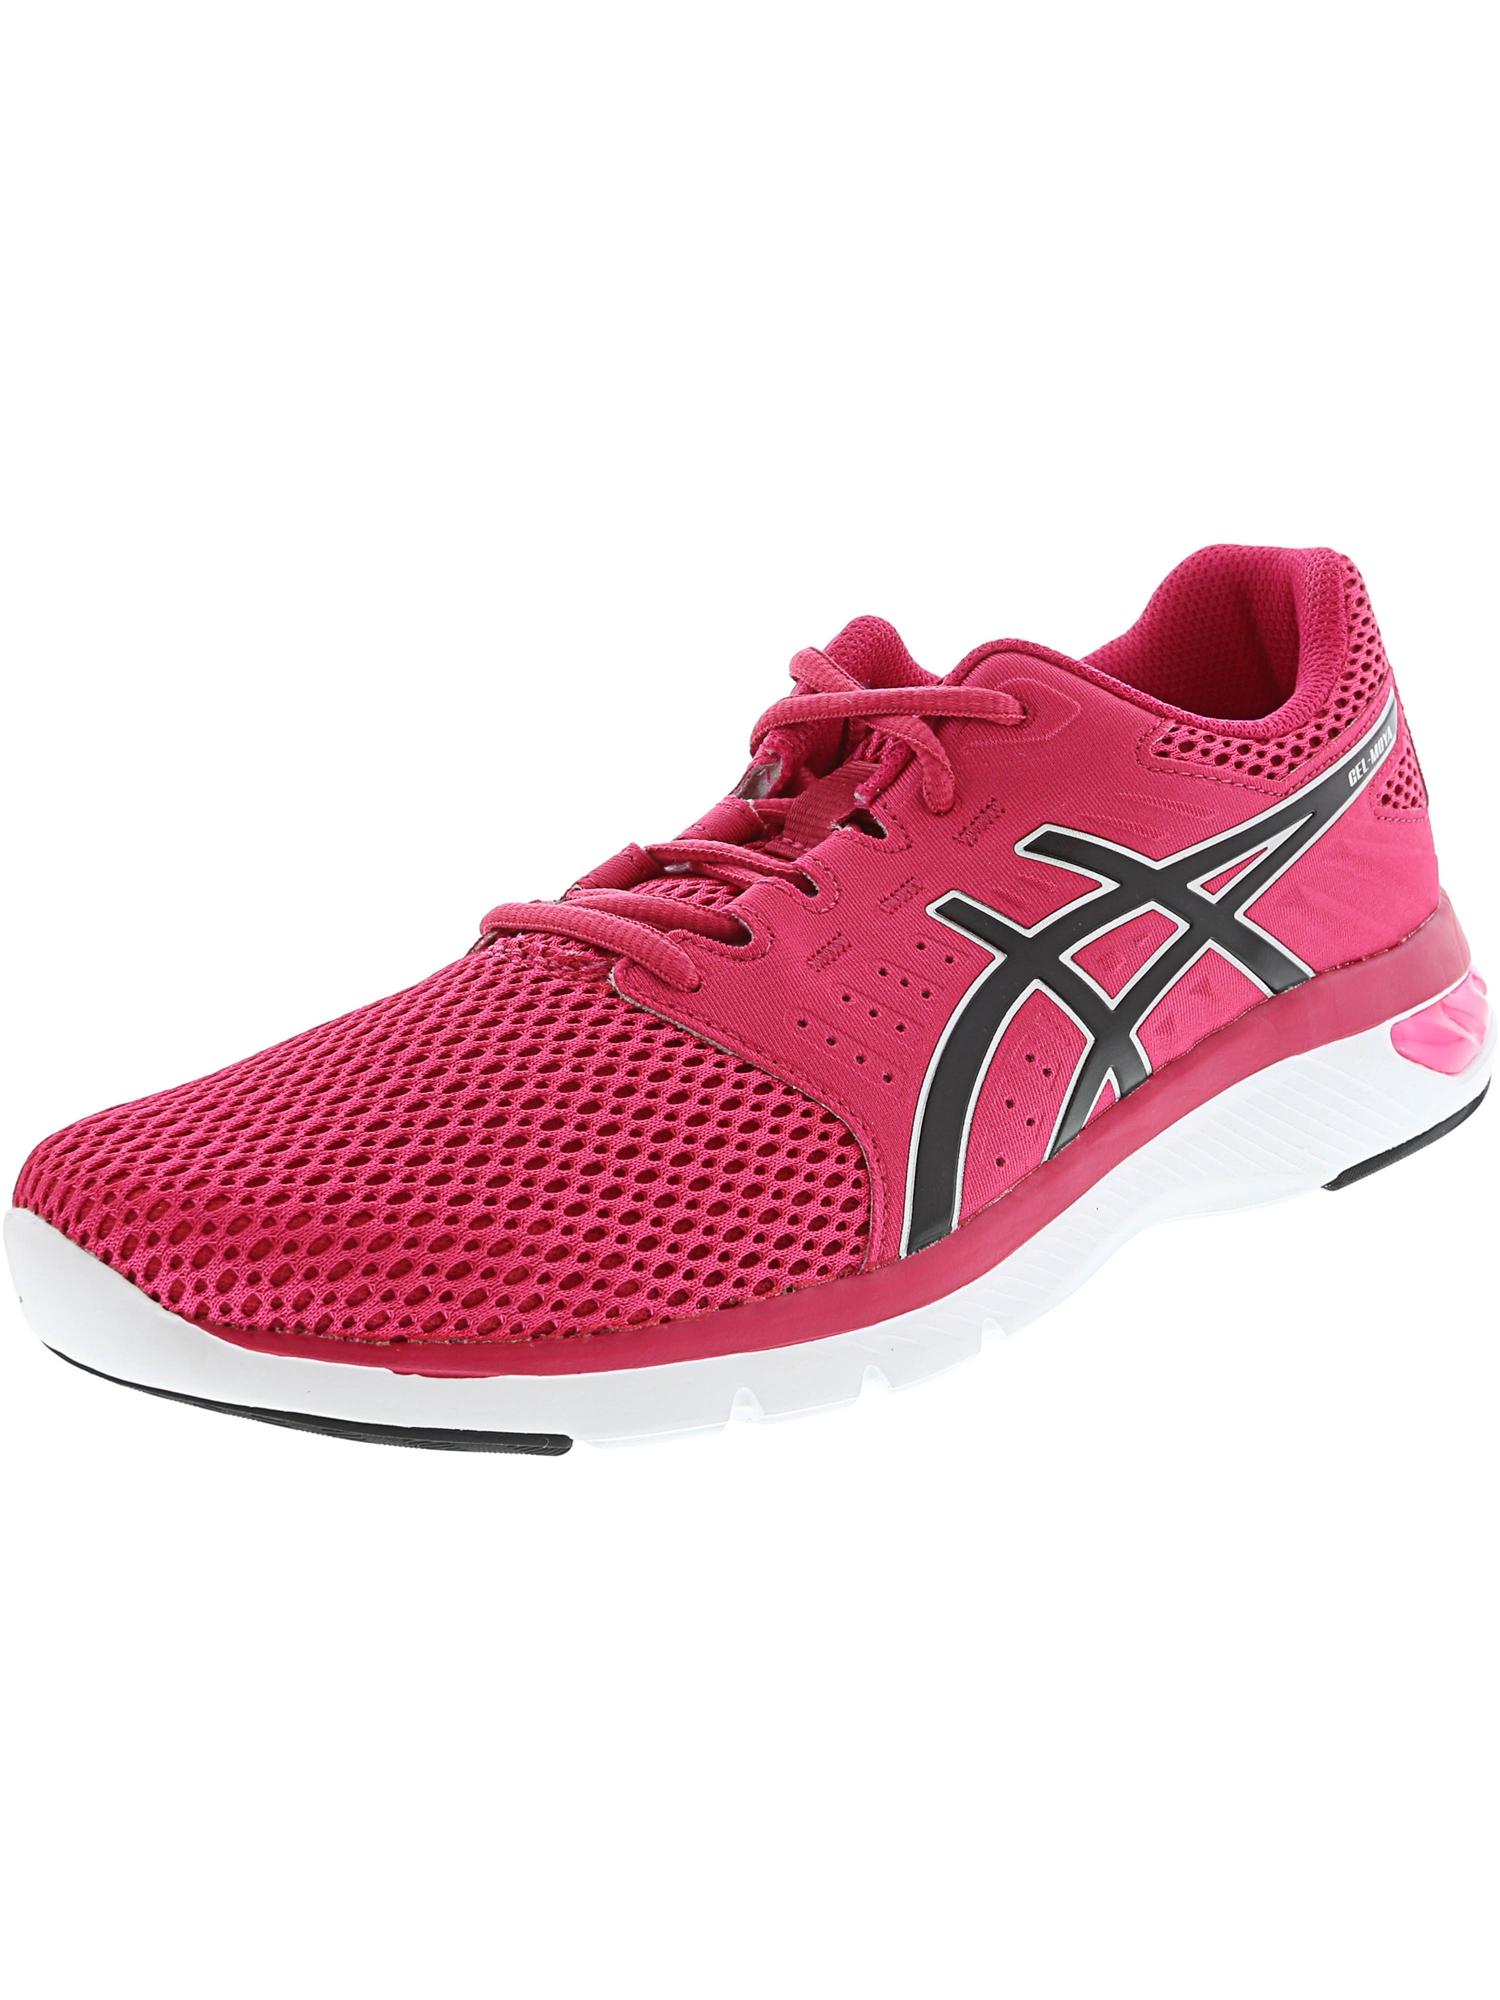 Women's GEL-Moya Running Shoe